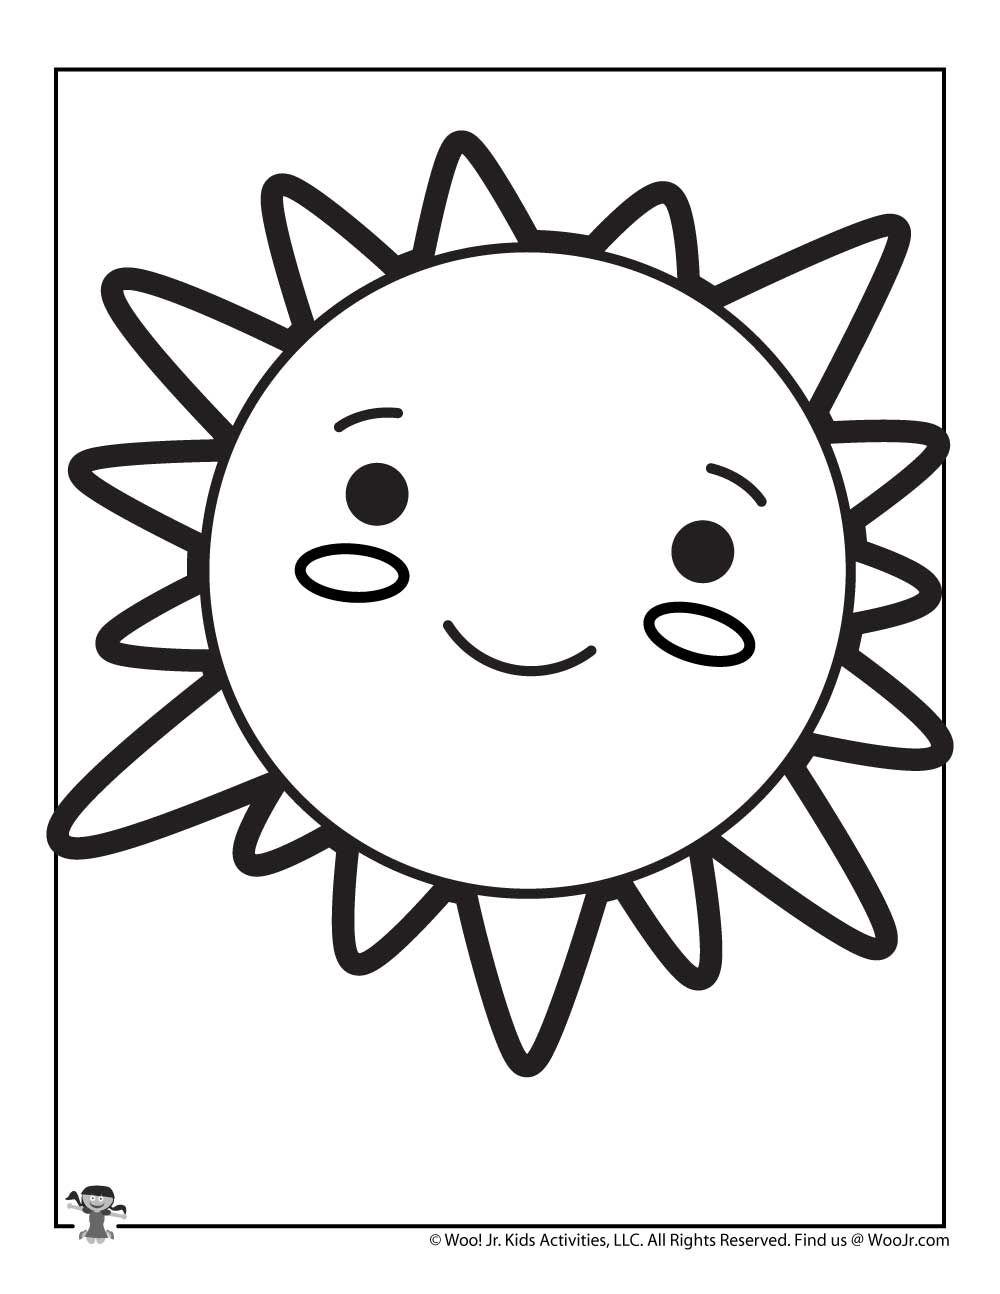 Cute Sun Coloring Page For Kids Woo Jr Kids Activities In 2020 Sun Coloring Pages Coloring Pages Cute Sun